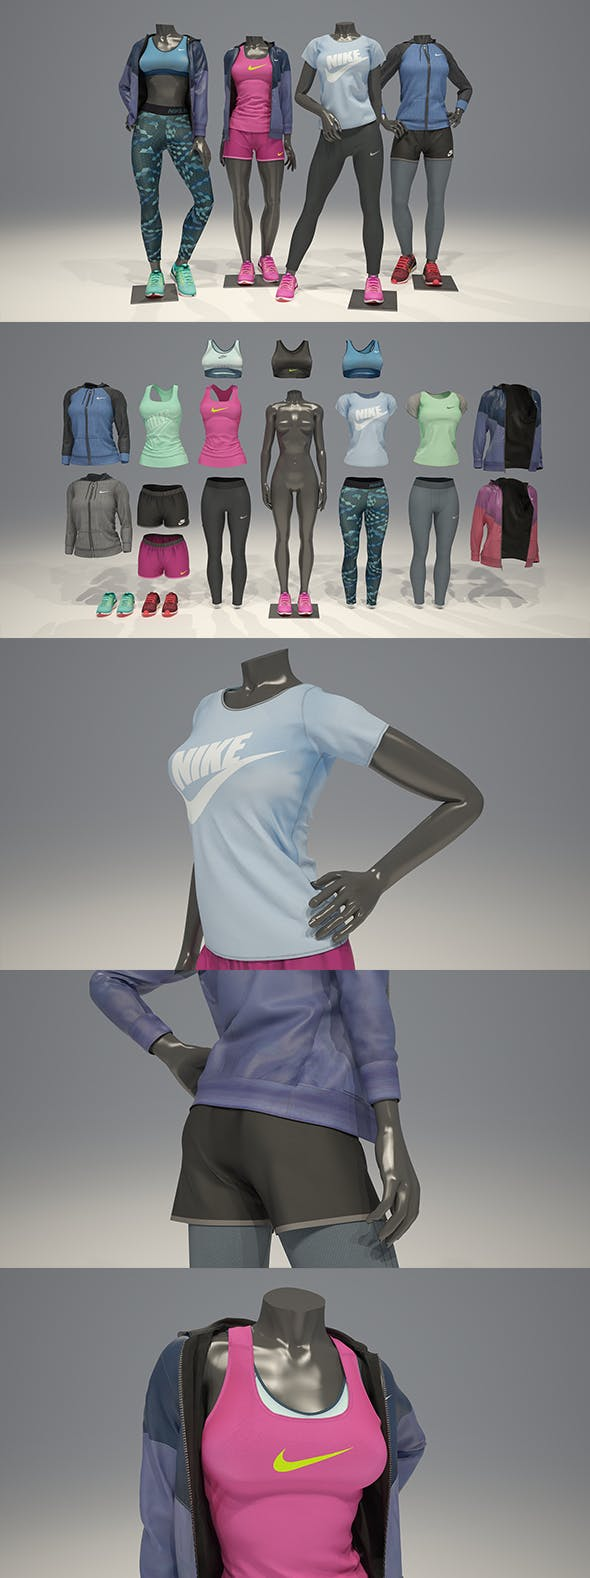 Female mannequin Nike pack 2 3D model - 3DOcean Item for Sale